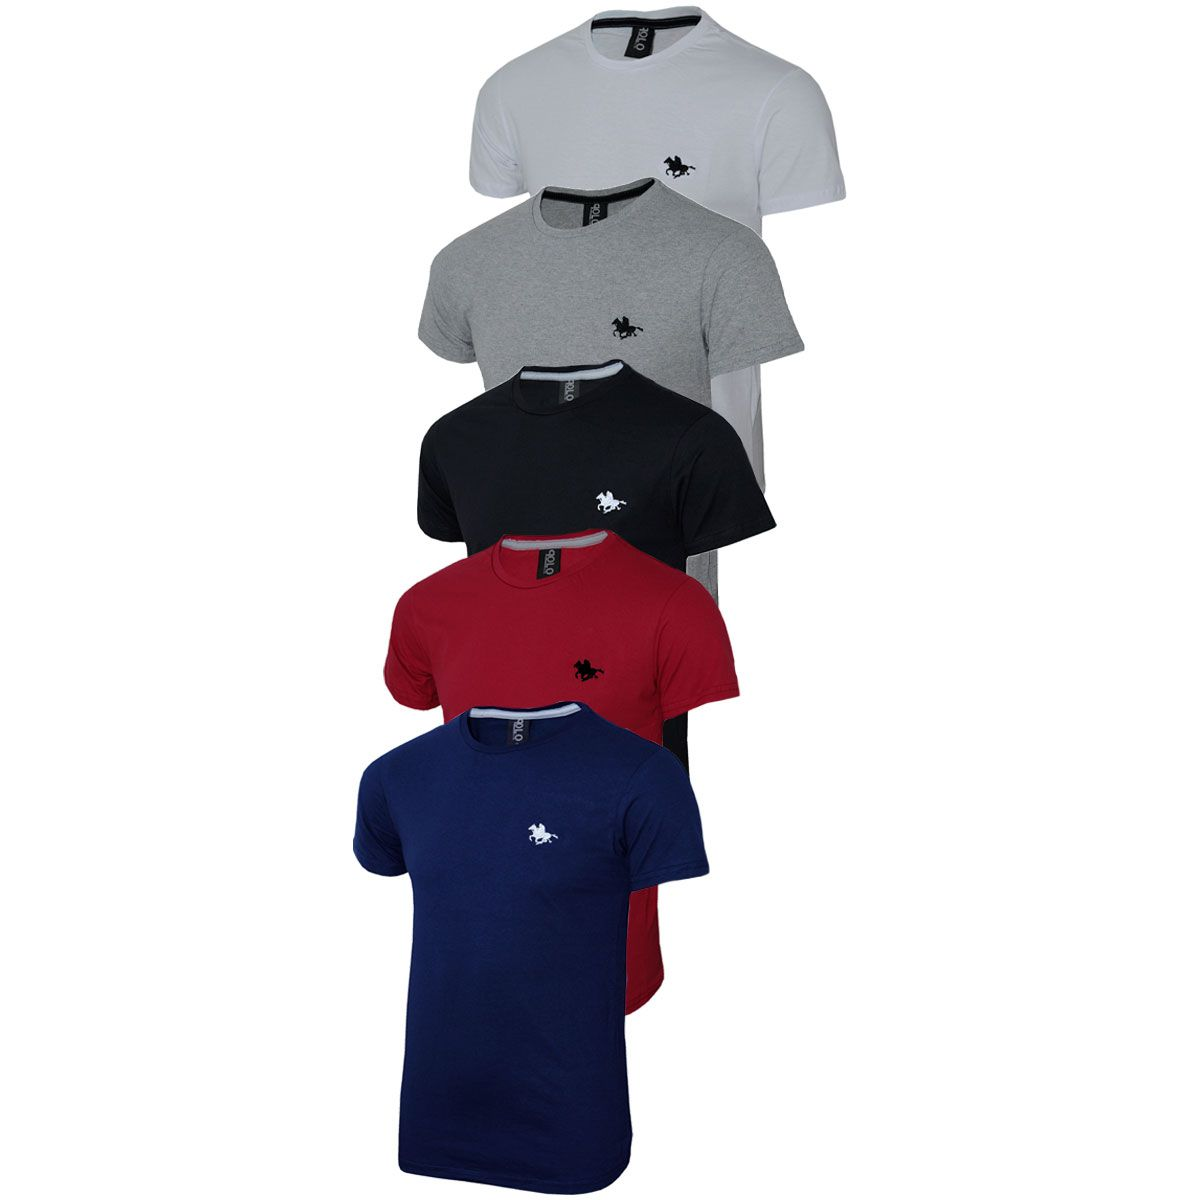 Kit Camisetas Masculinas Básicas 5 Cores Polo RG518